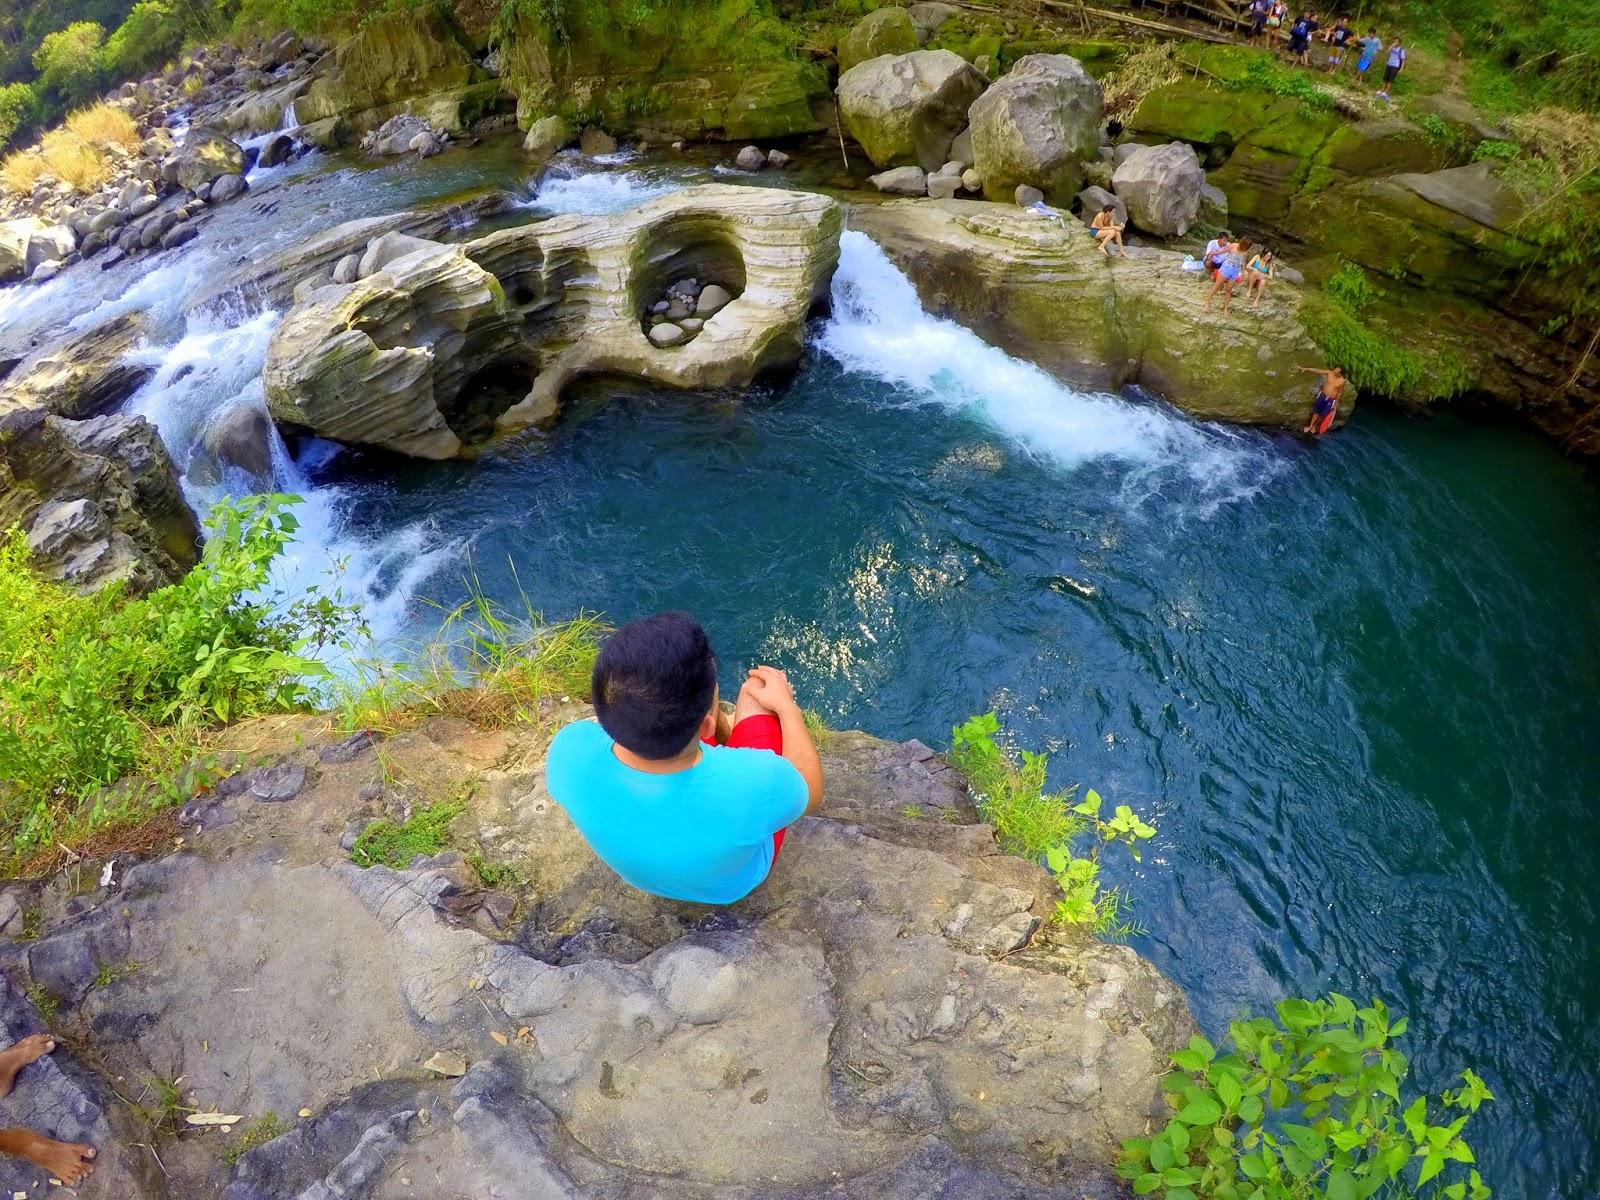 Cliff Diving Spot Tangadan Falls